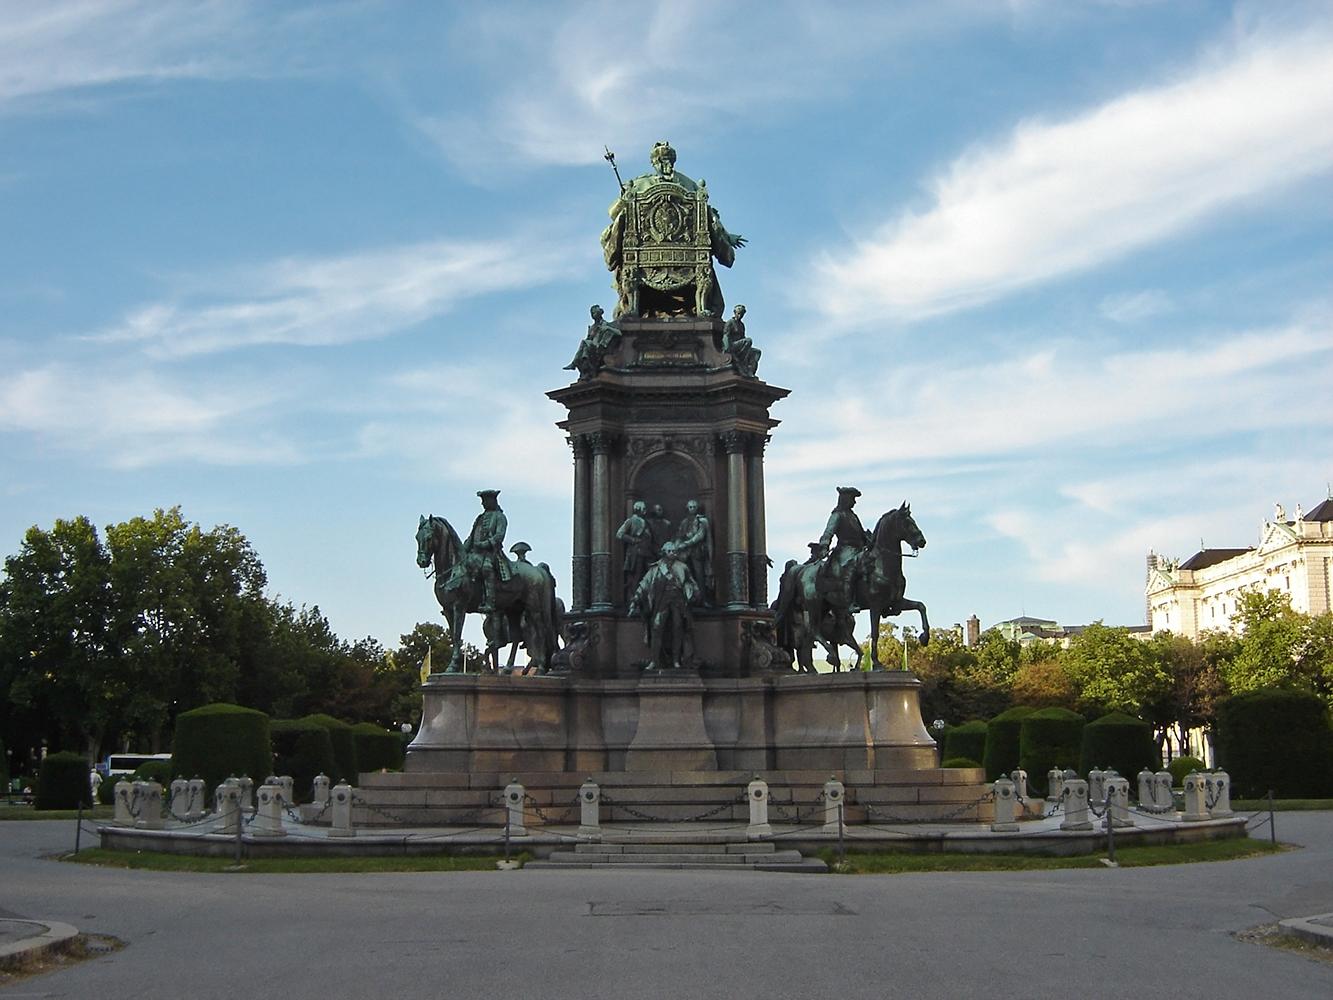 Maria-Theresien Platz